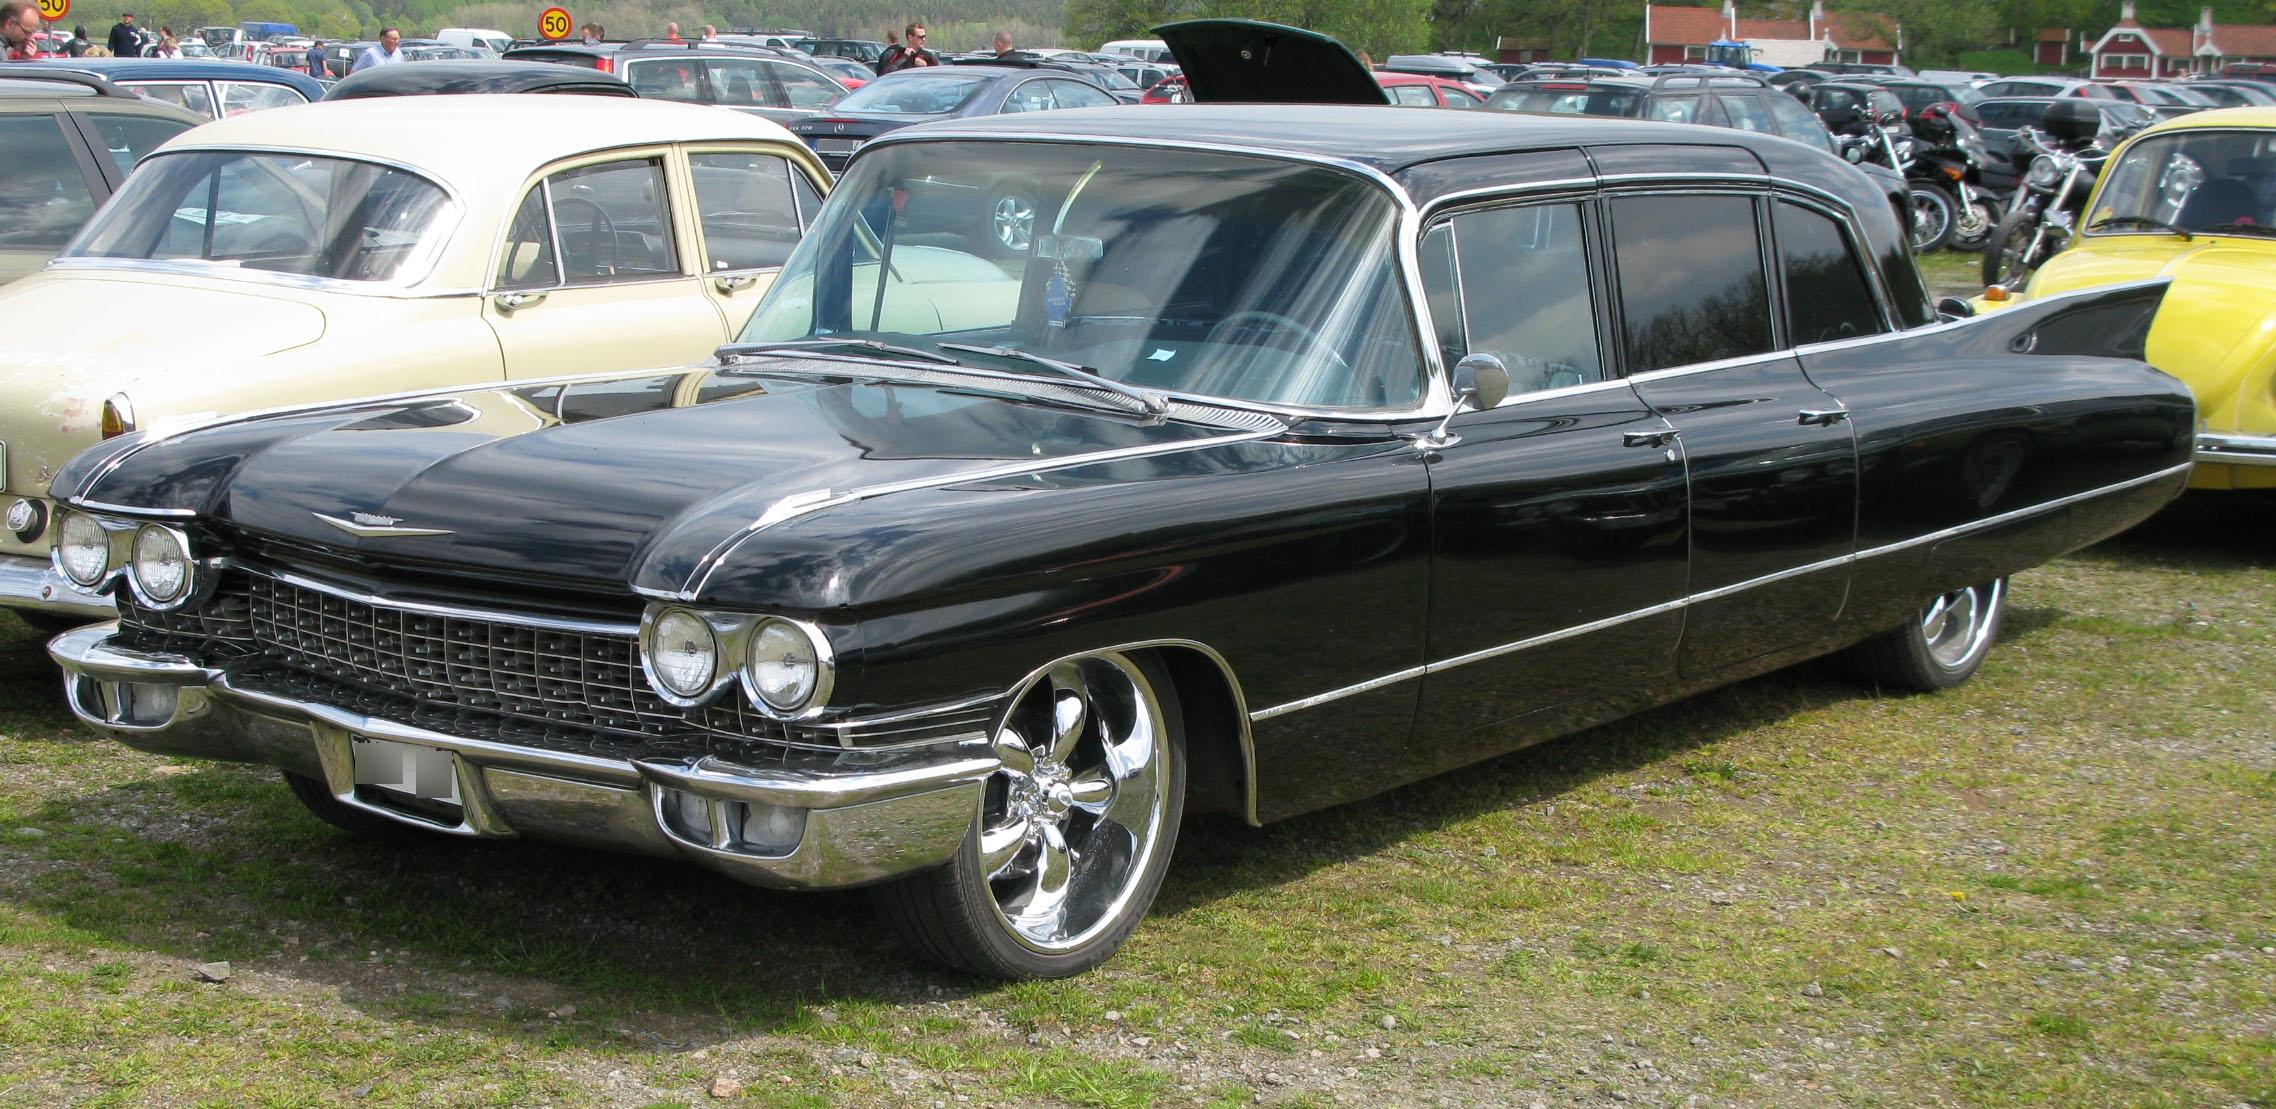 File:1960 Cadillac Series 75 fl.jpg